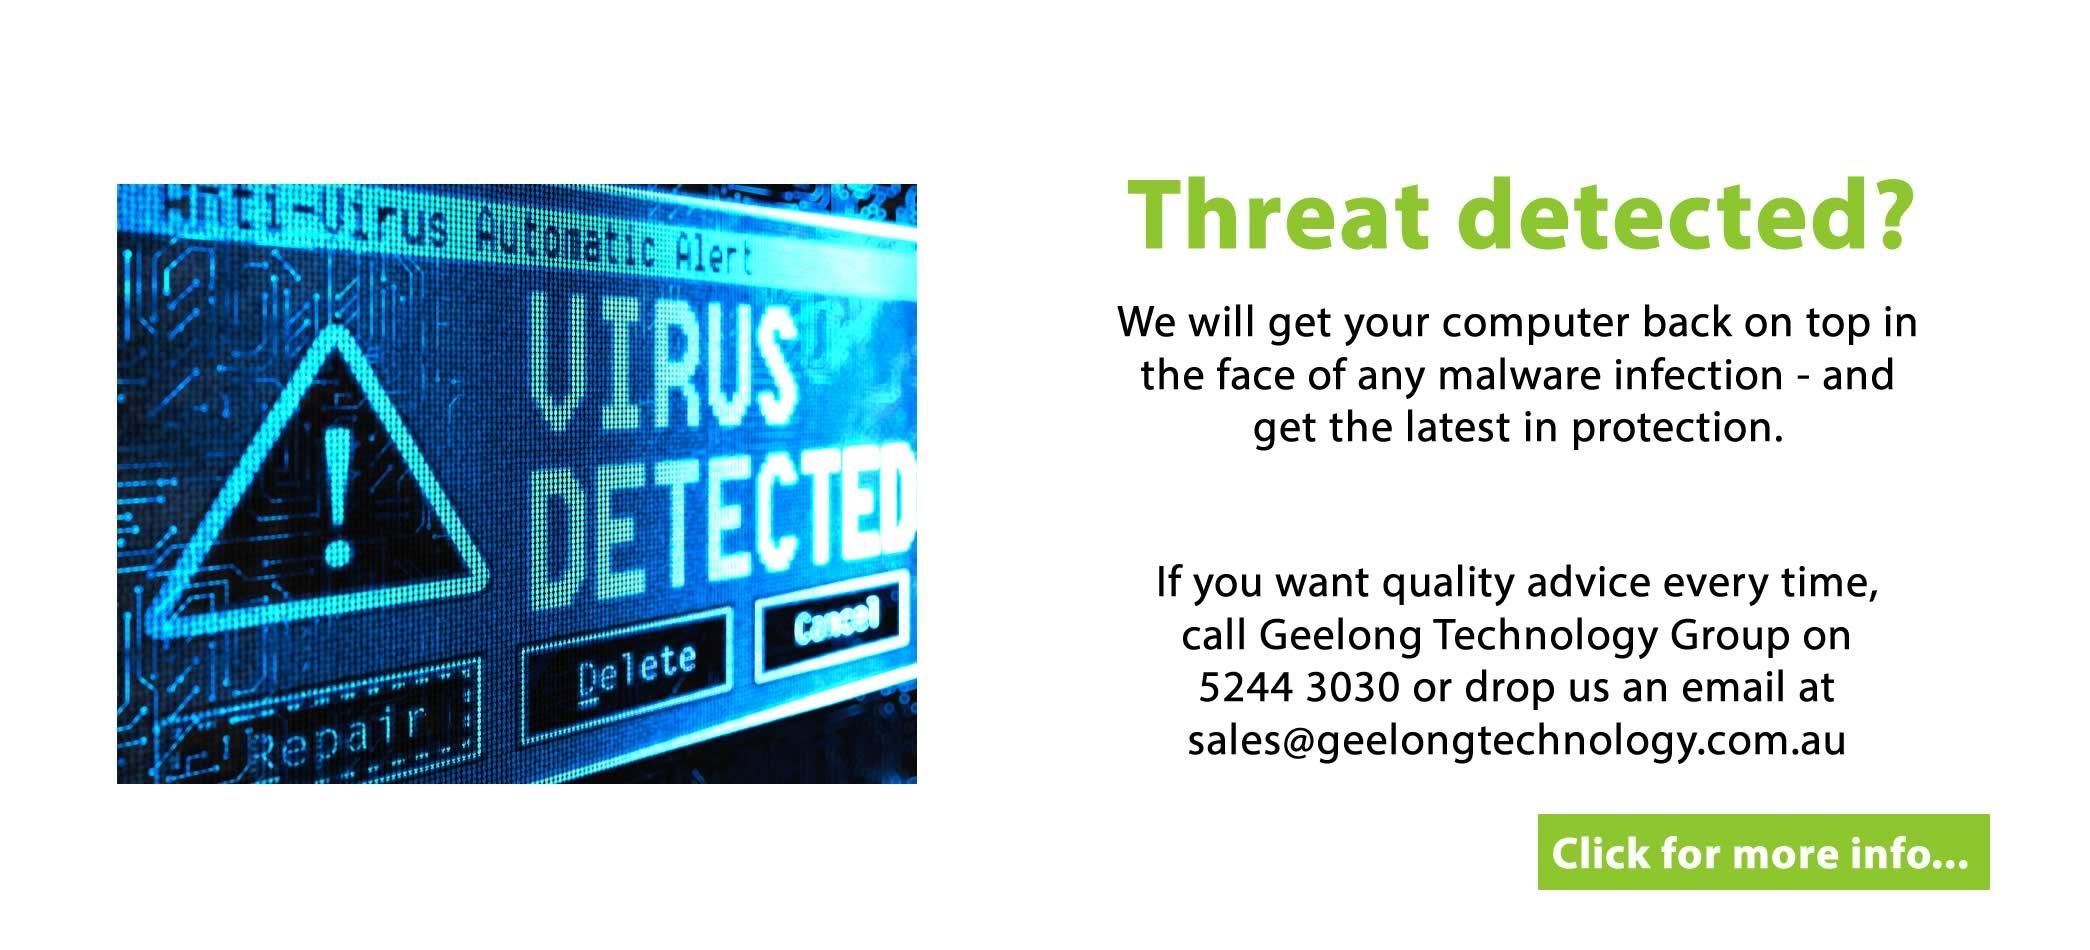 Threat detected?